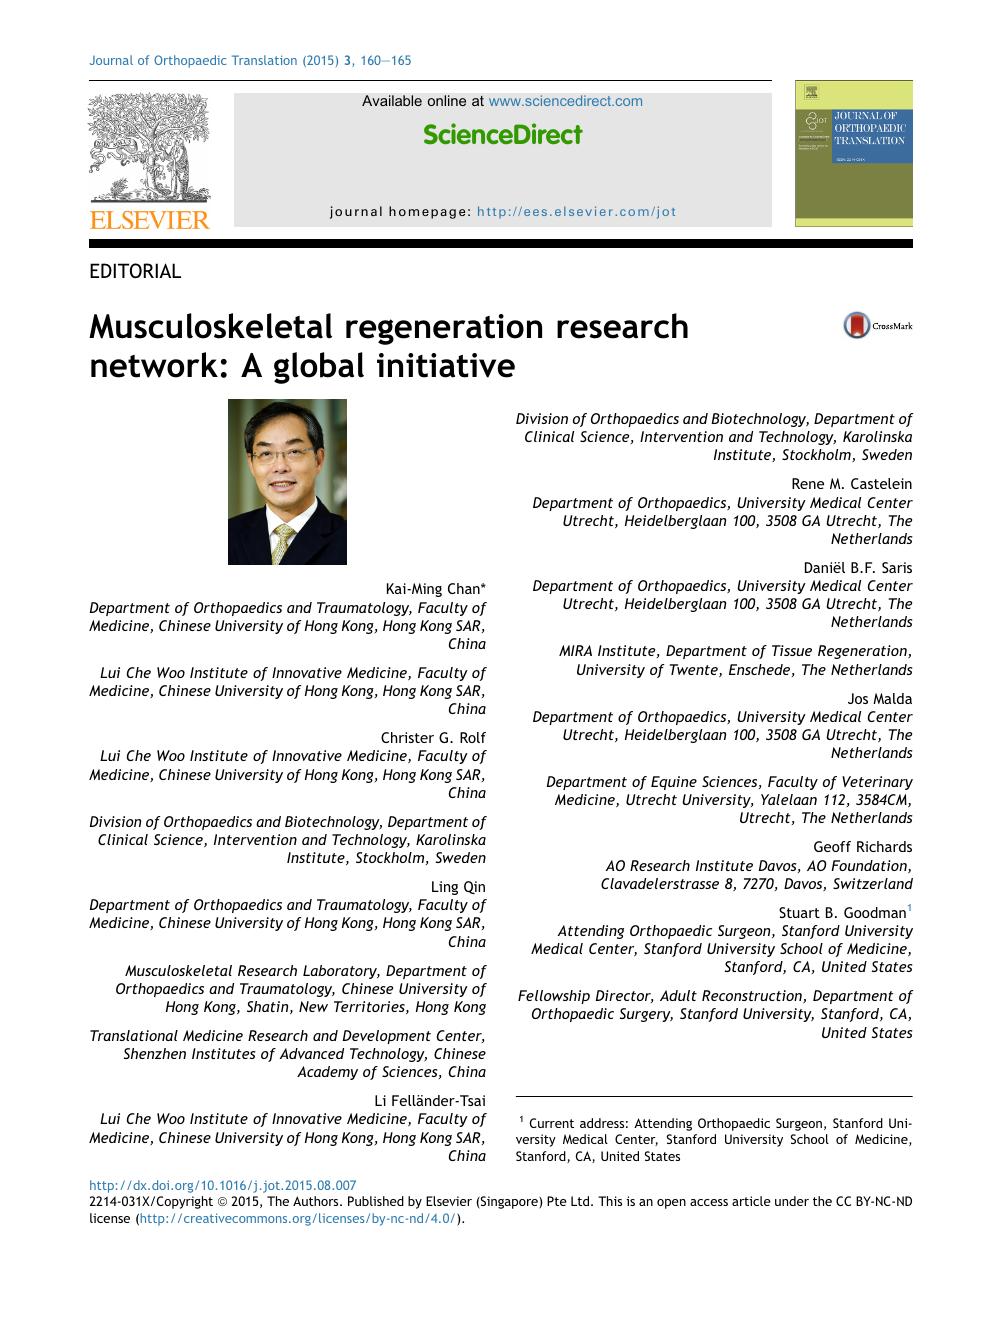 Musculoskeletal regeneration research network: A global